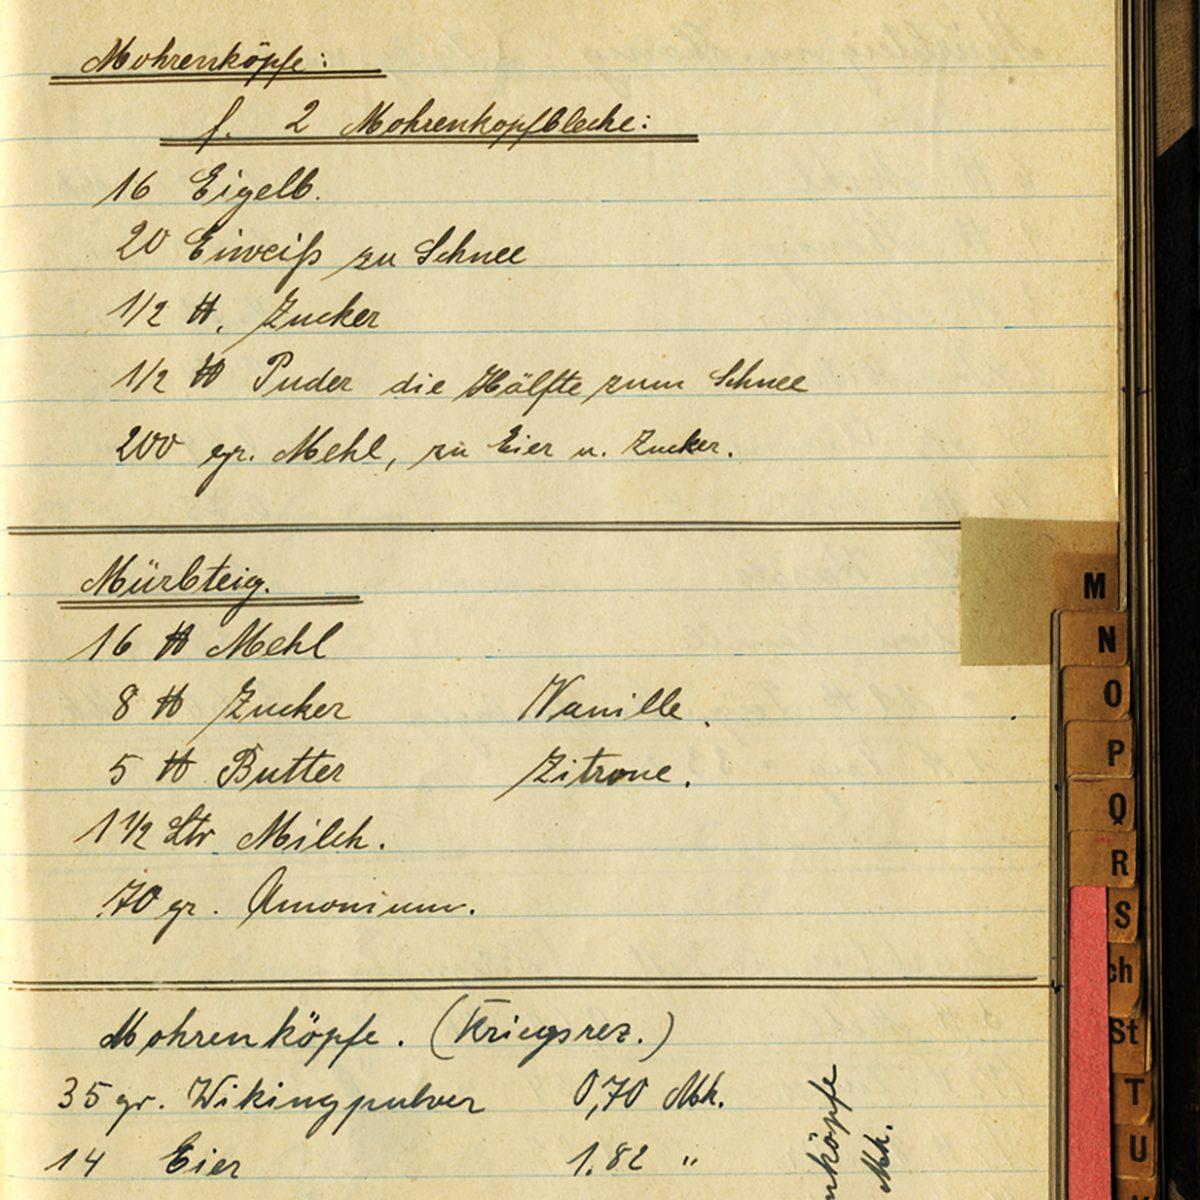 grungy page of bakeries vintage handwritten cookbook